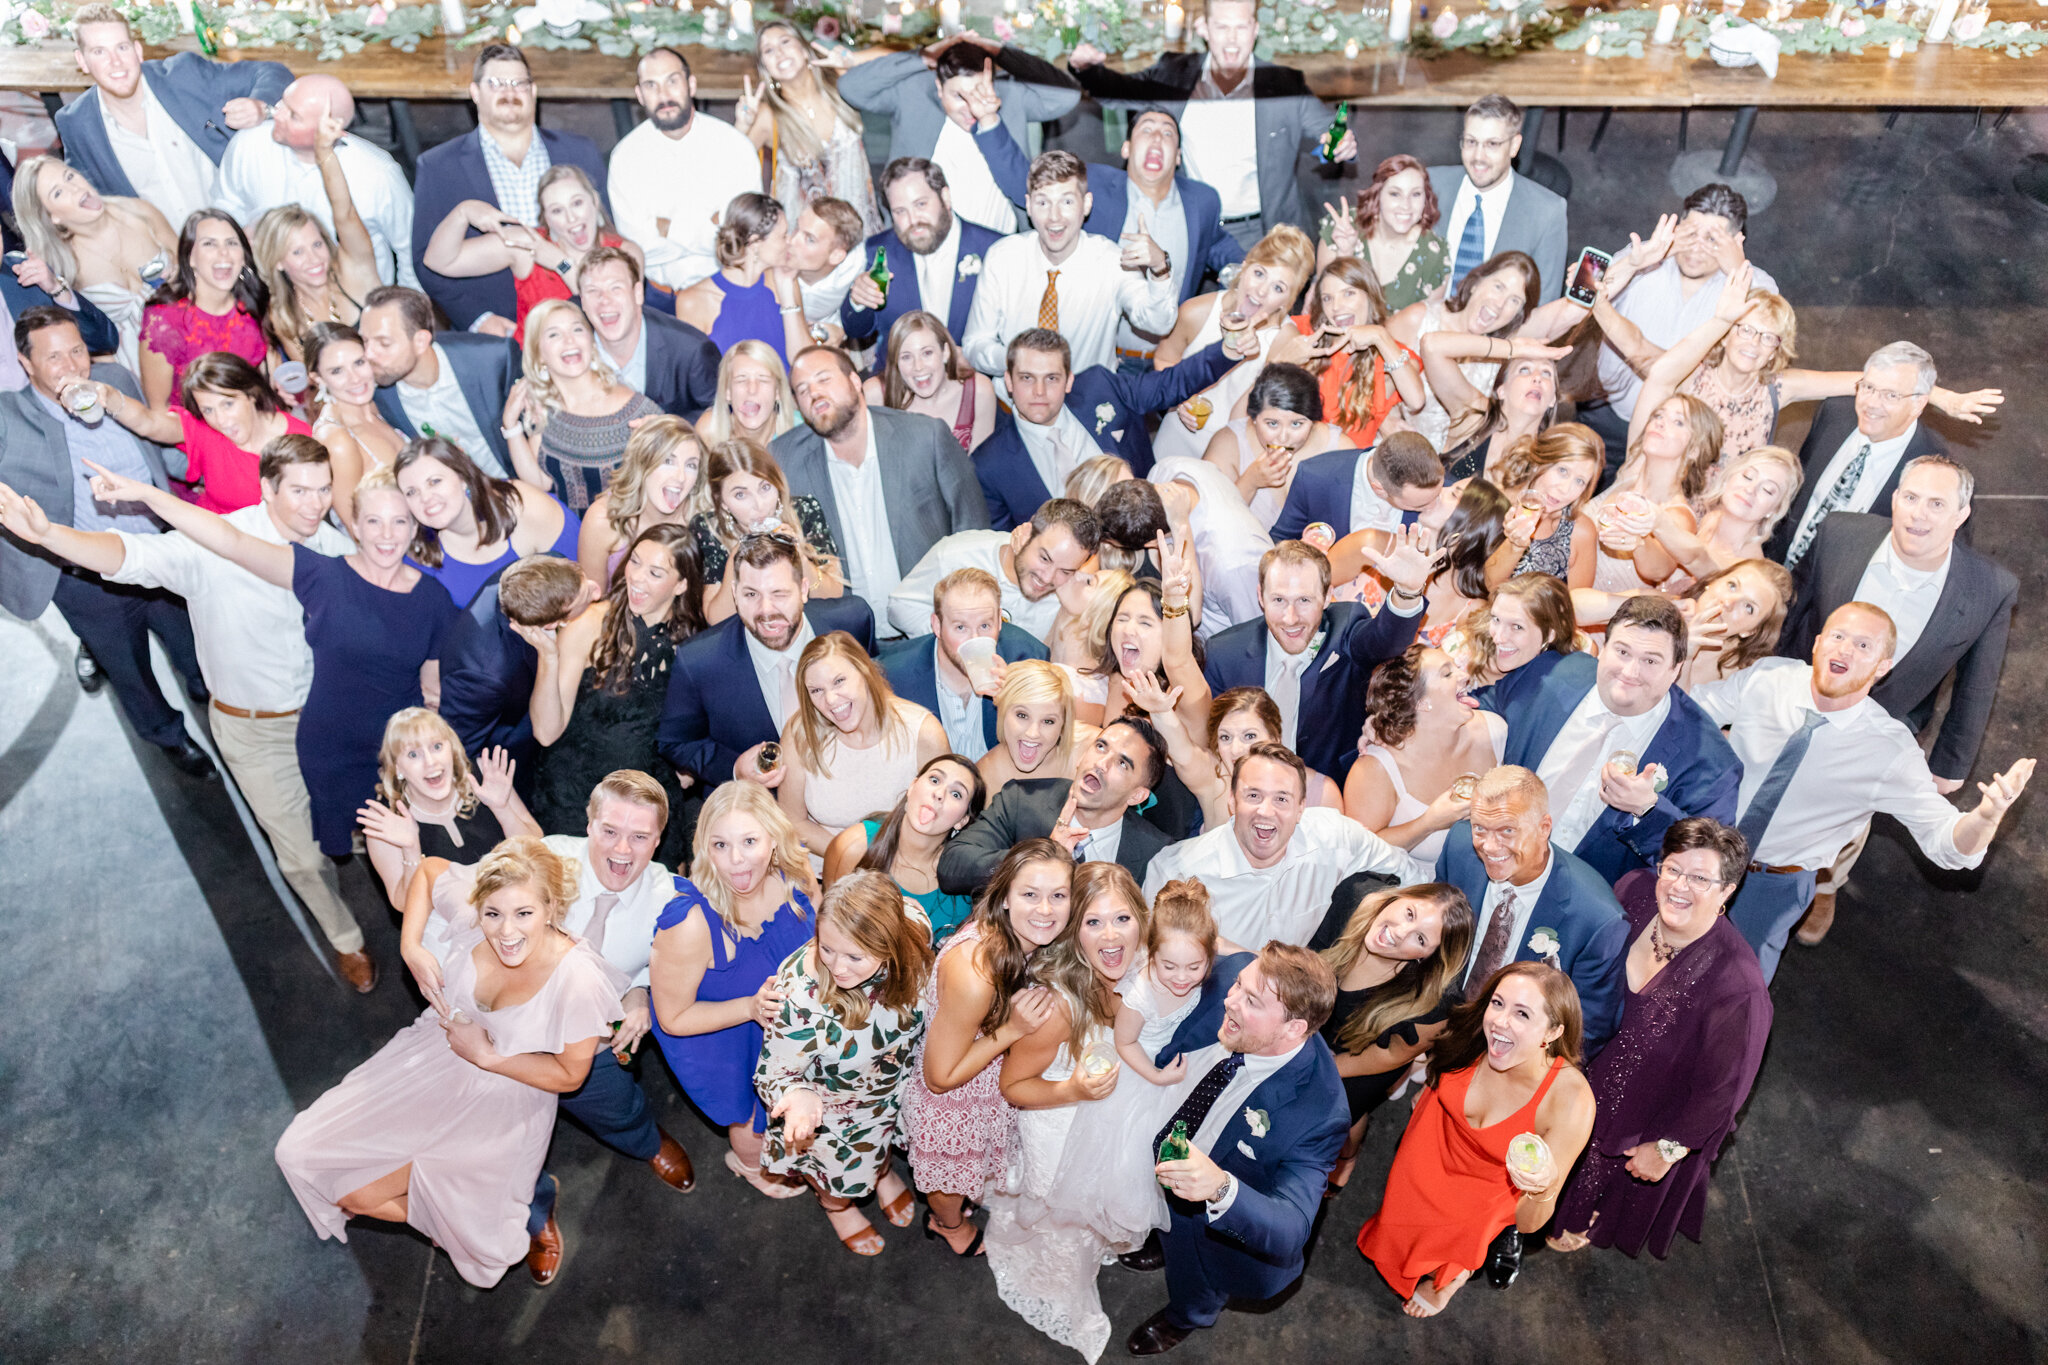 San Antonio Austin Boerne New Braunfels Spring Branch Texas Wedding Engagement Photographer Photography Hill Country Texas Park 31 Wedding Summer Wedding Pink Navy Gold Elegant Chic Wedding San Antonio Austin Texas photographer 101